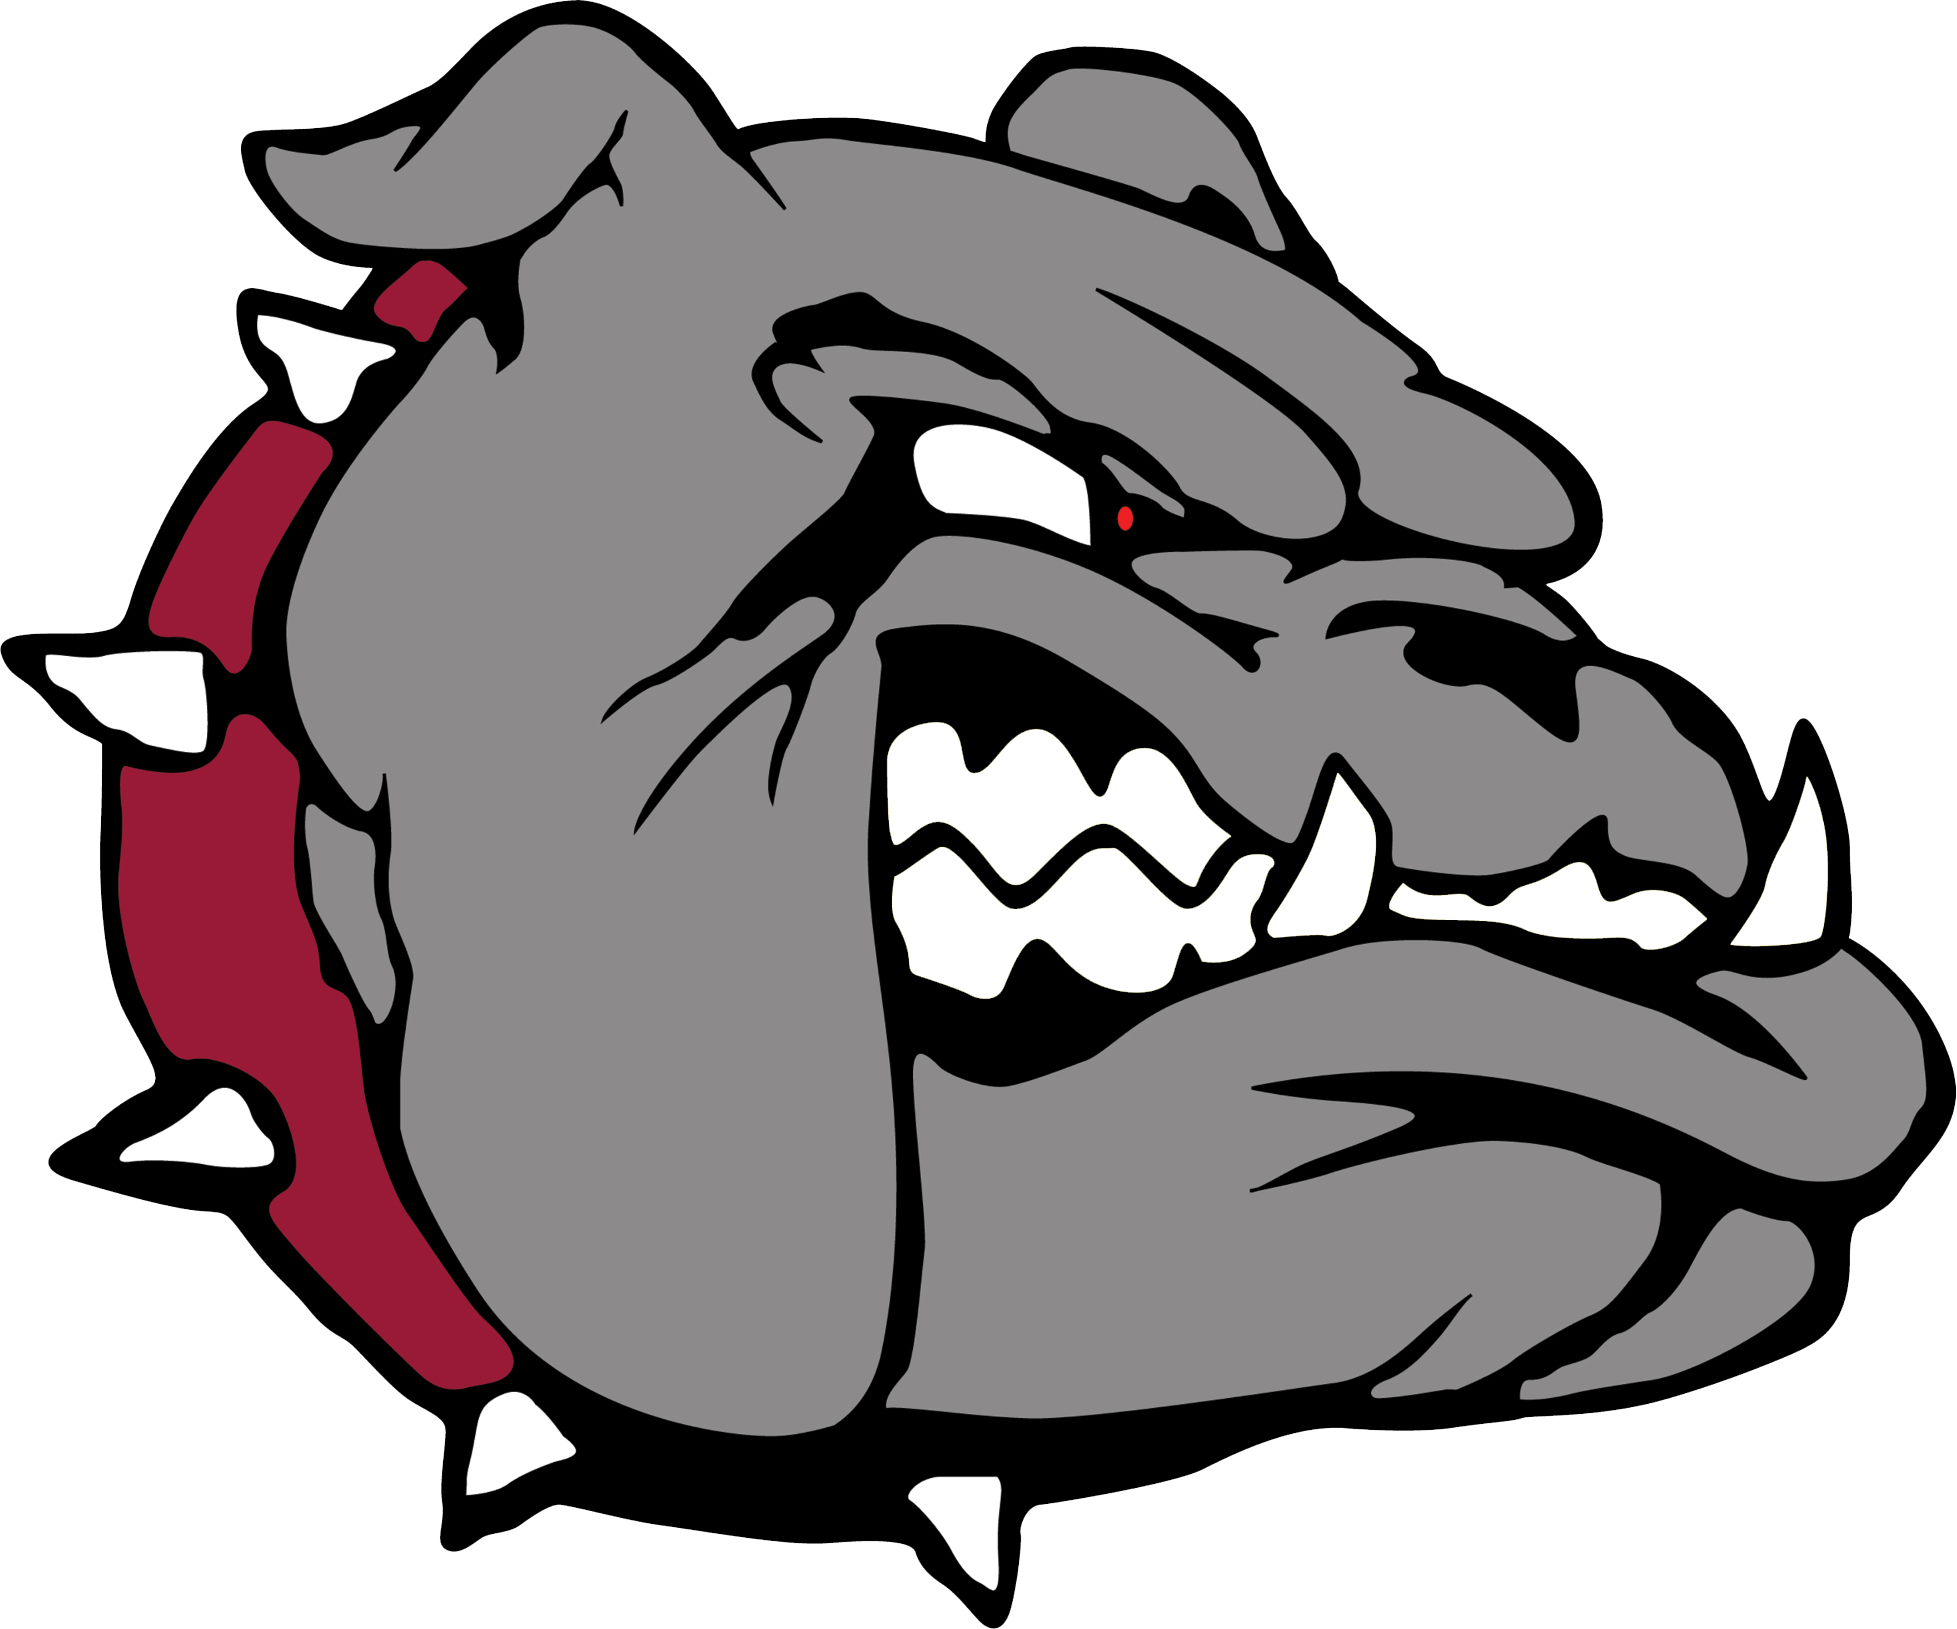 Bulldog mascot clipart with basketball clip art transparent download Thaddeus Stevens Bulldogs - Main View | My Athletics | Campus Life ... clip art transparent download